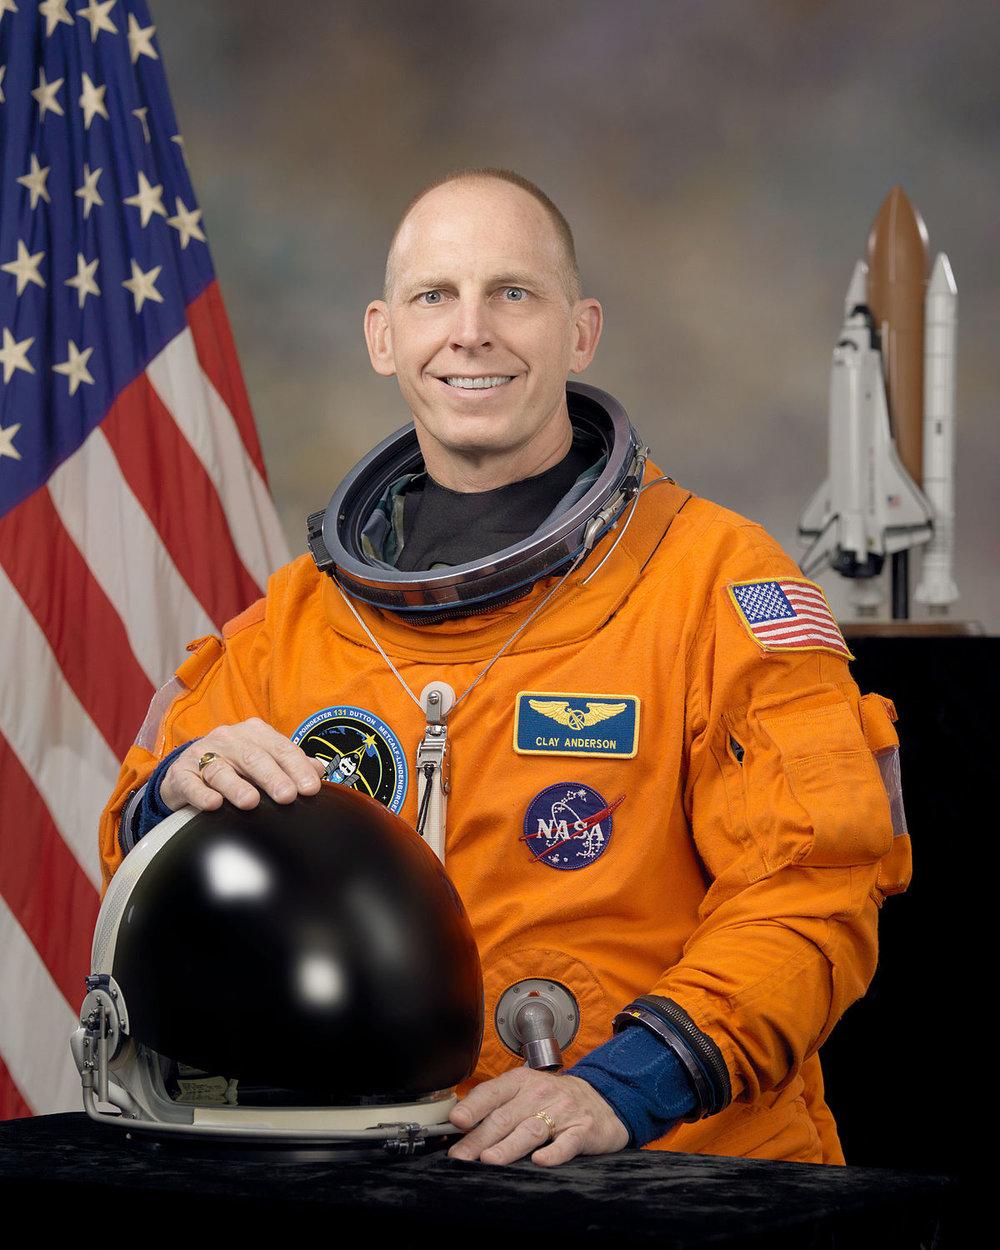 AstronautClaytonAnderson1.jpg